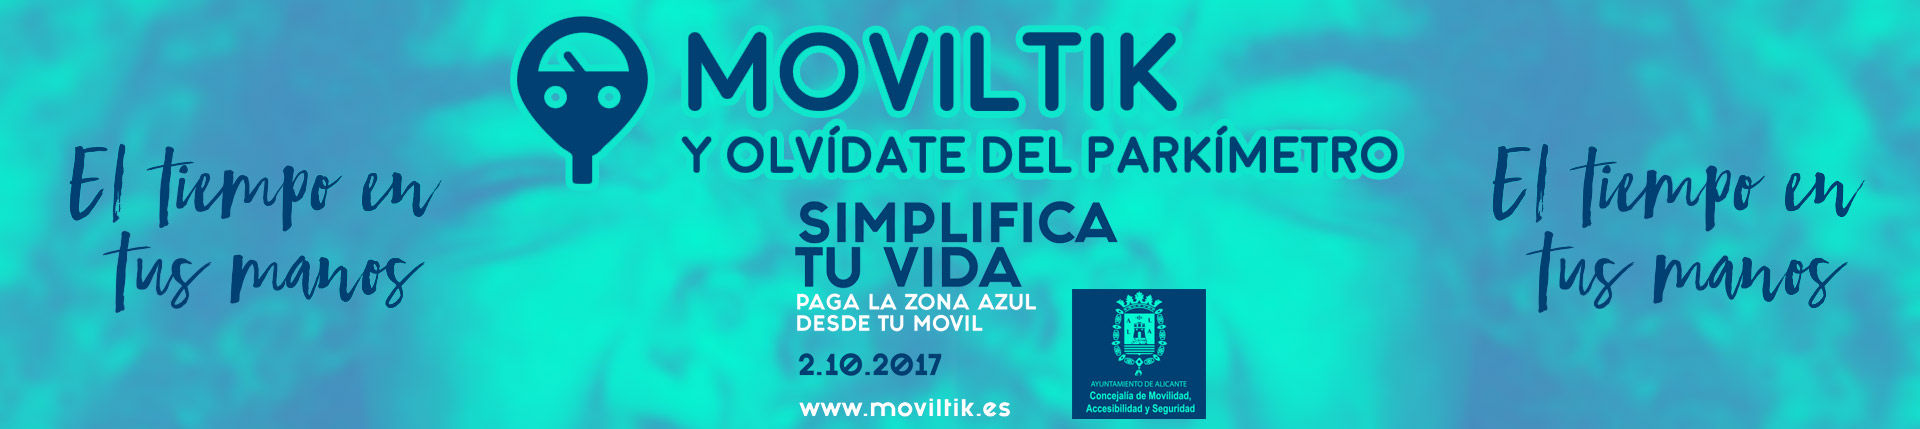 Moviltik - paga la zona azul desde tu móvil